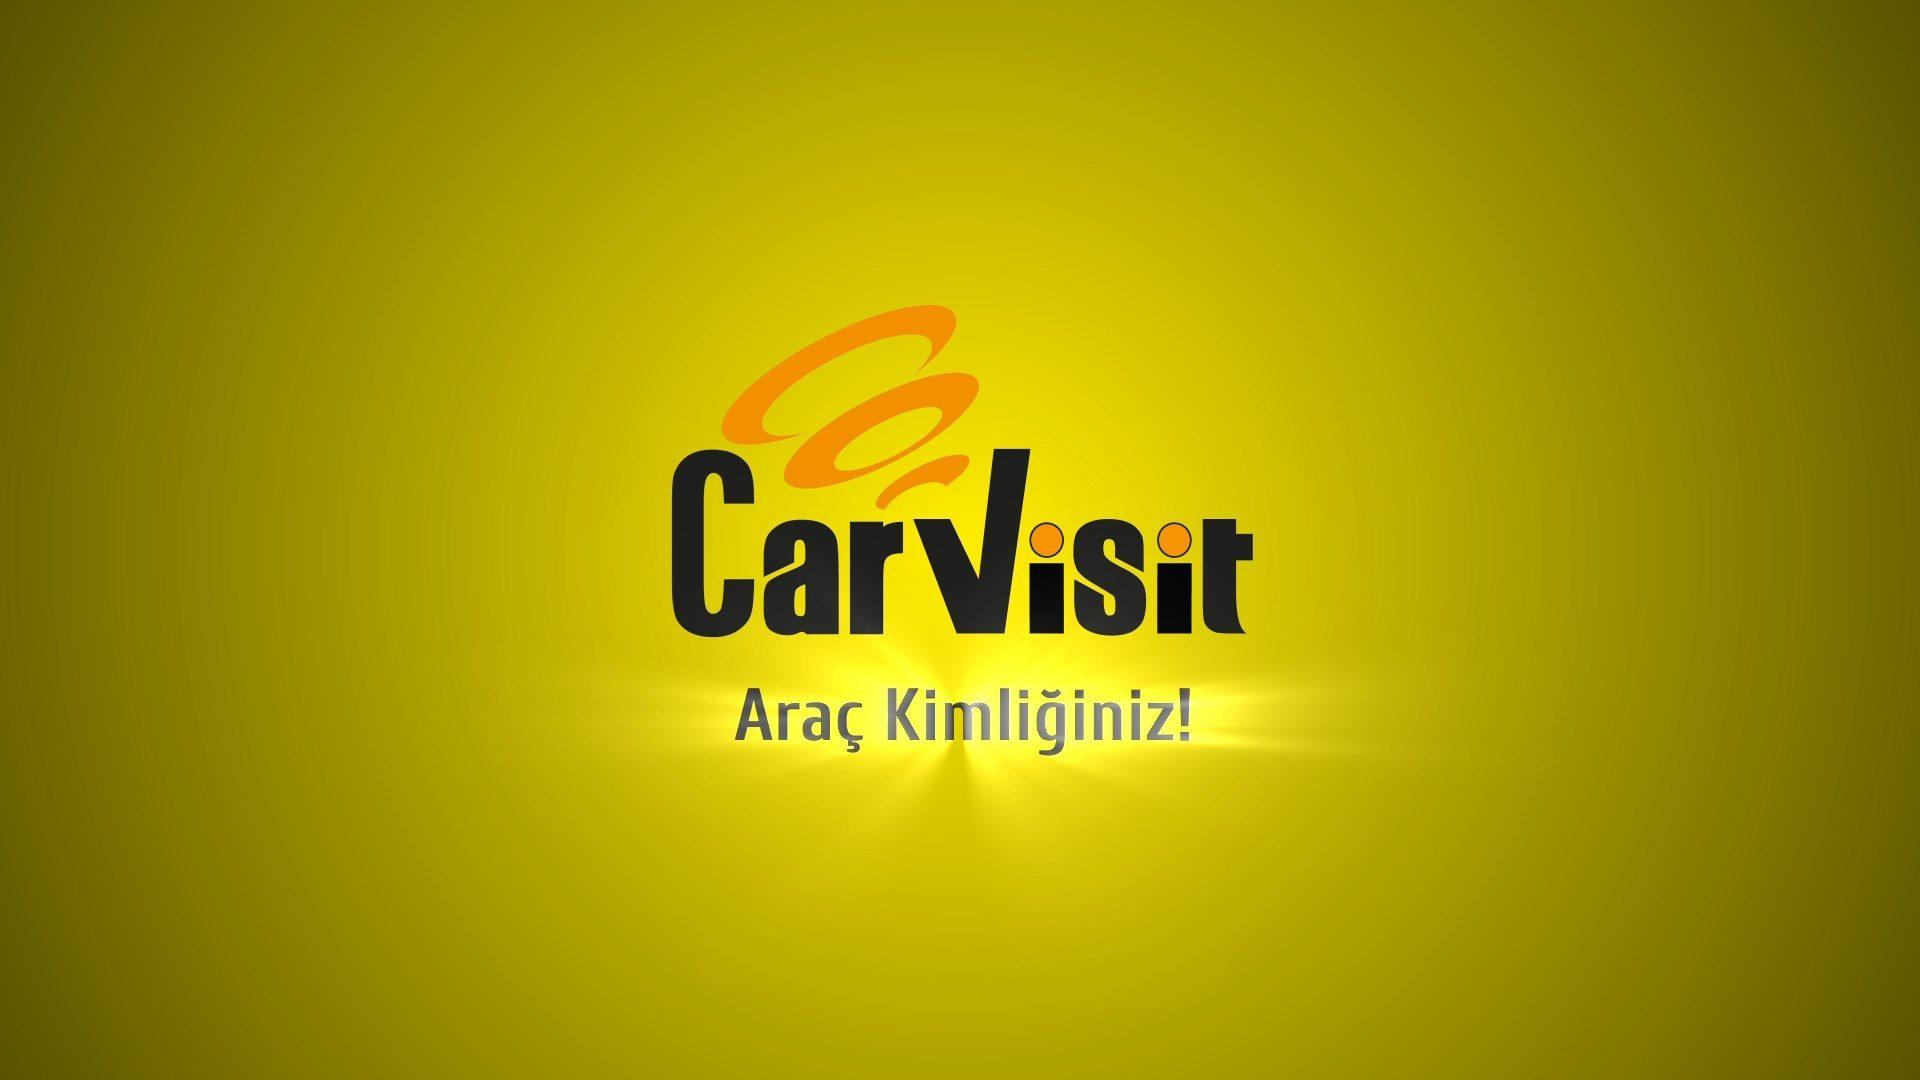 carvisit1 1920x1080 - Car-visit Reklam Filmi